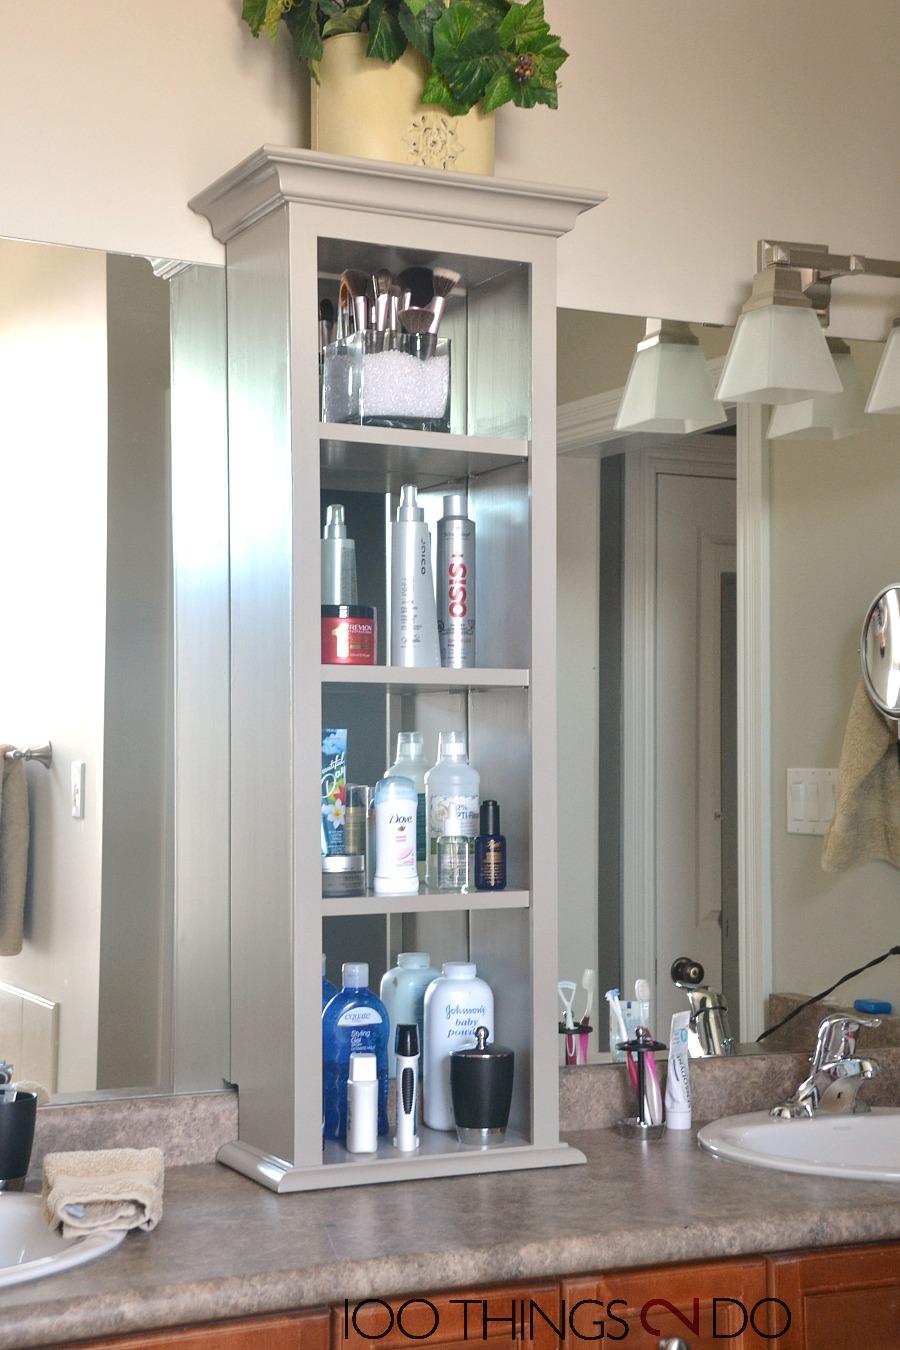 bathroom counter storage tower. bathroom storage tower, vanity cabinet on vanity, counter tower u